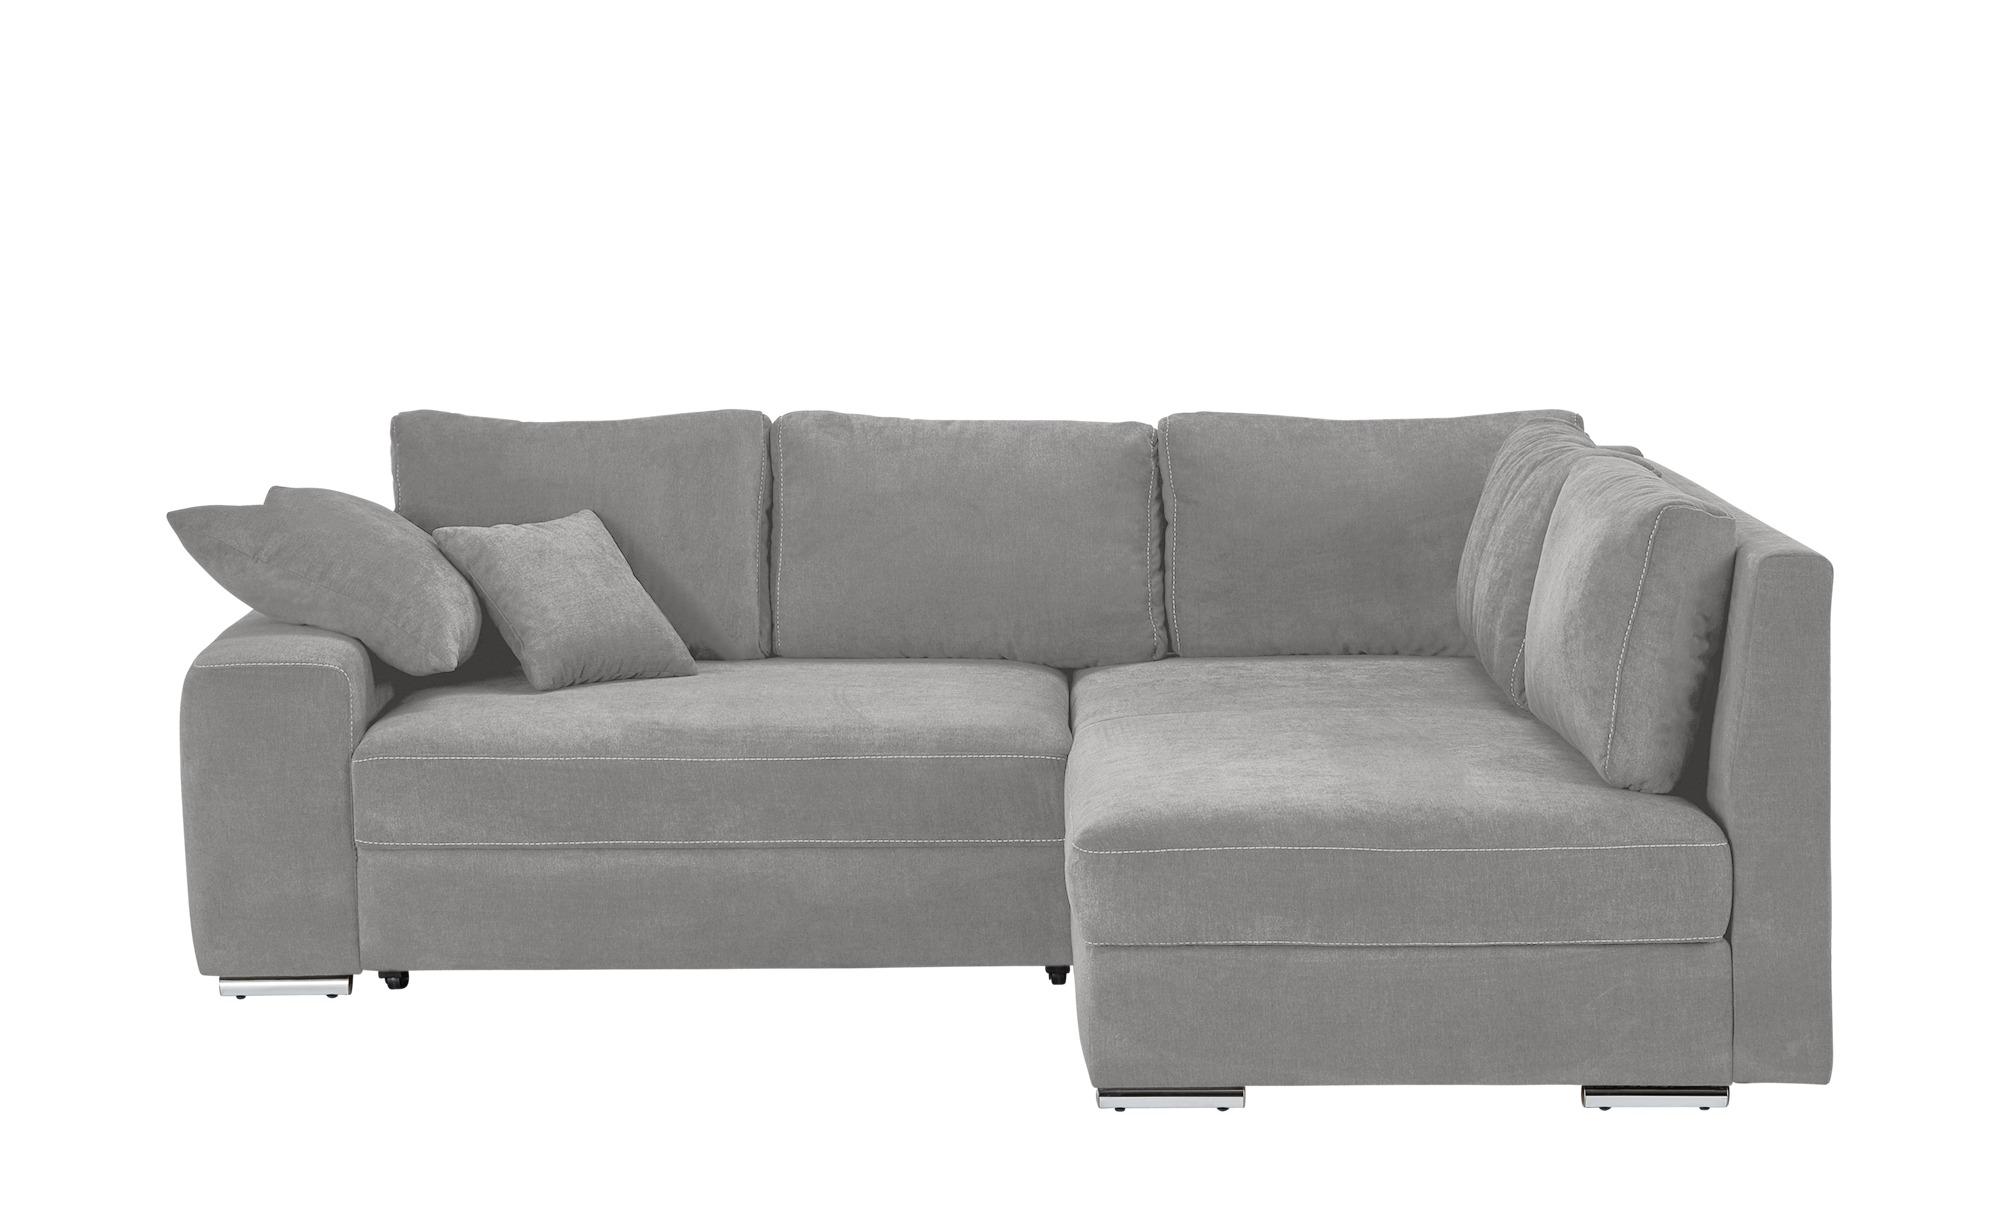 ecksofa kaila deluxe breite h he 90 cm grau online kaufen bei woonio. Black Bedroom Furniture Sets. Home Design Ideas